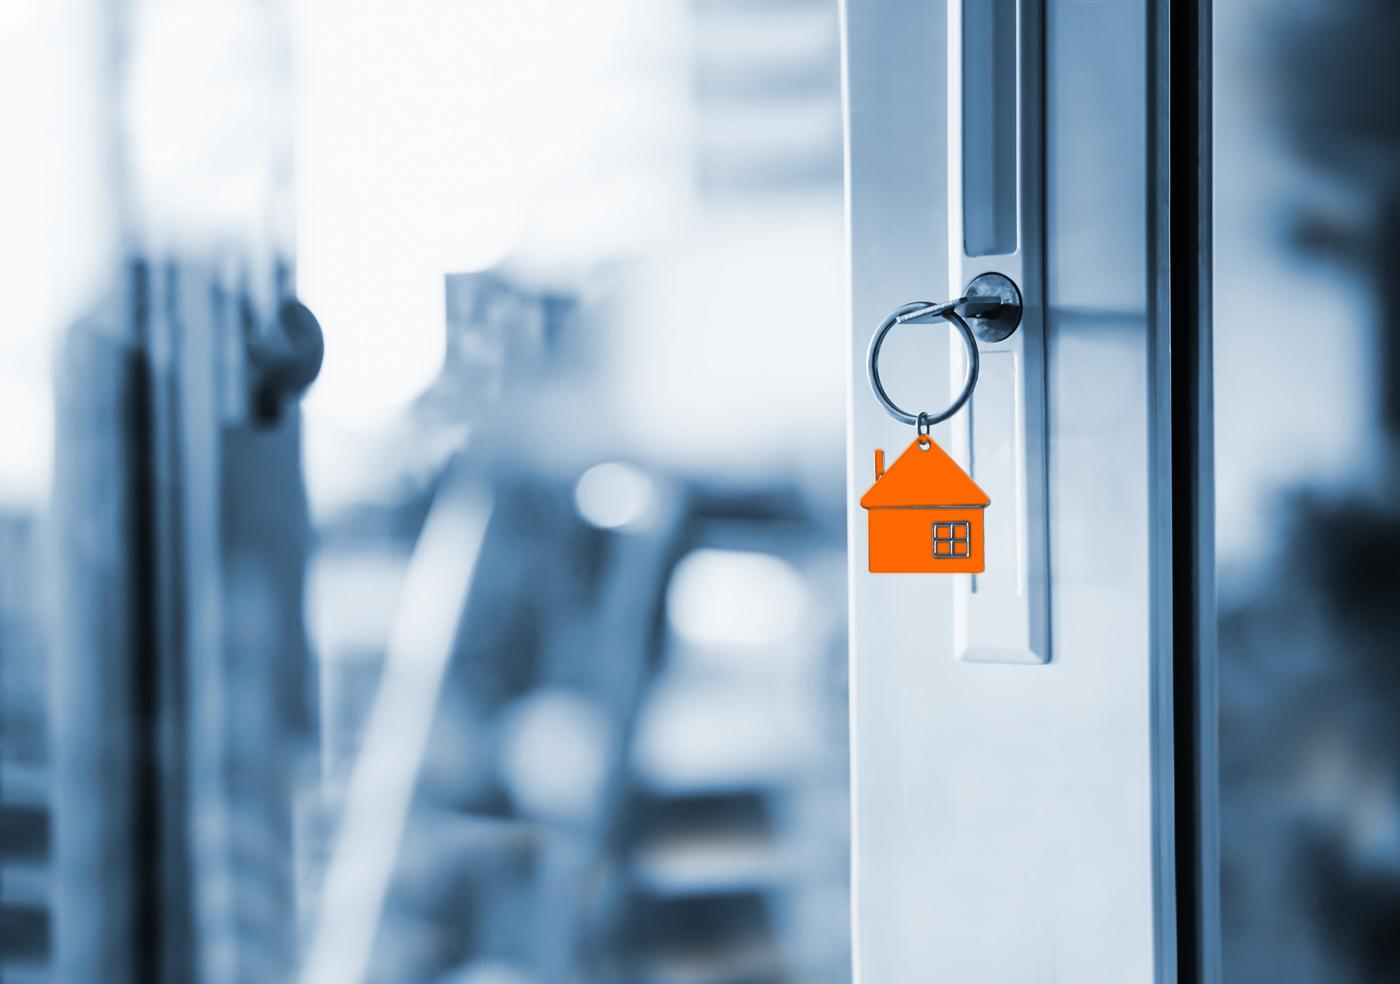 BPL affordable housing